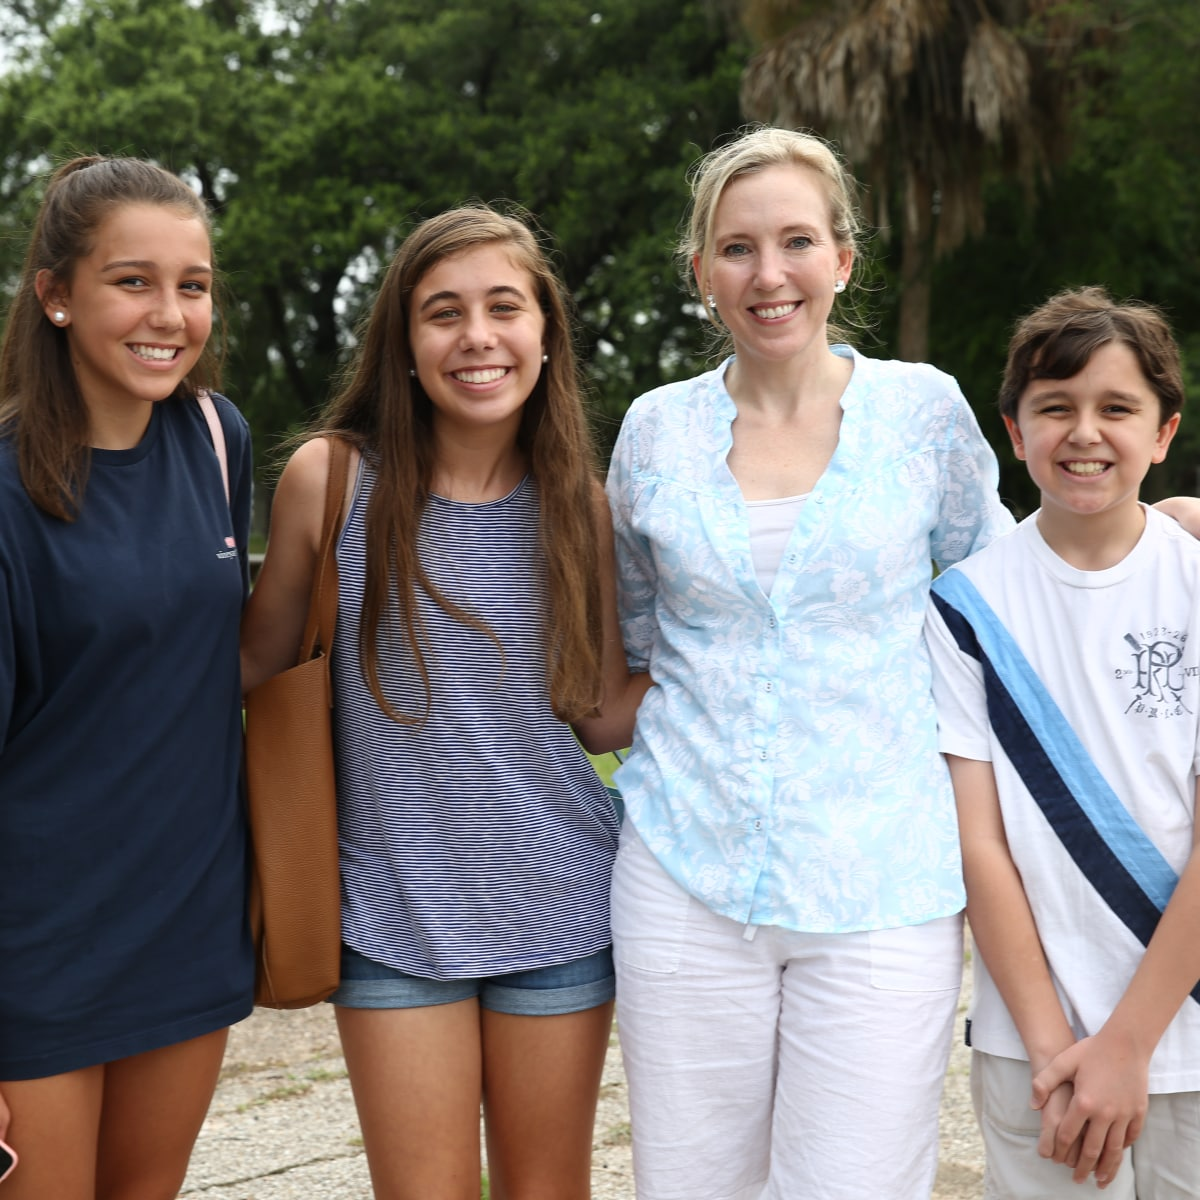 News, Shelby, Evelyn's Park Groundbreaking, june 2015, Mary Birbeck, Emma Stein, Melissa Birbeck, Charlie Birbeck